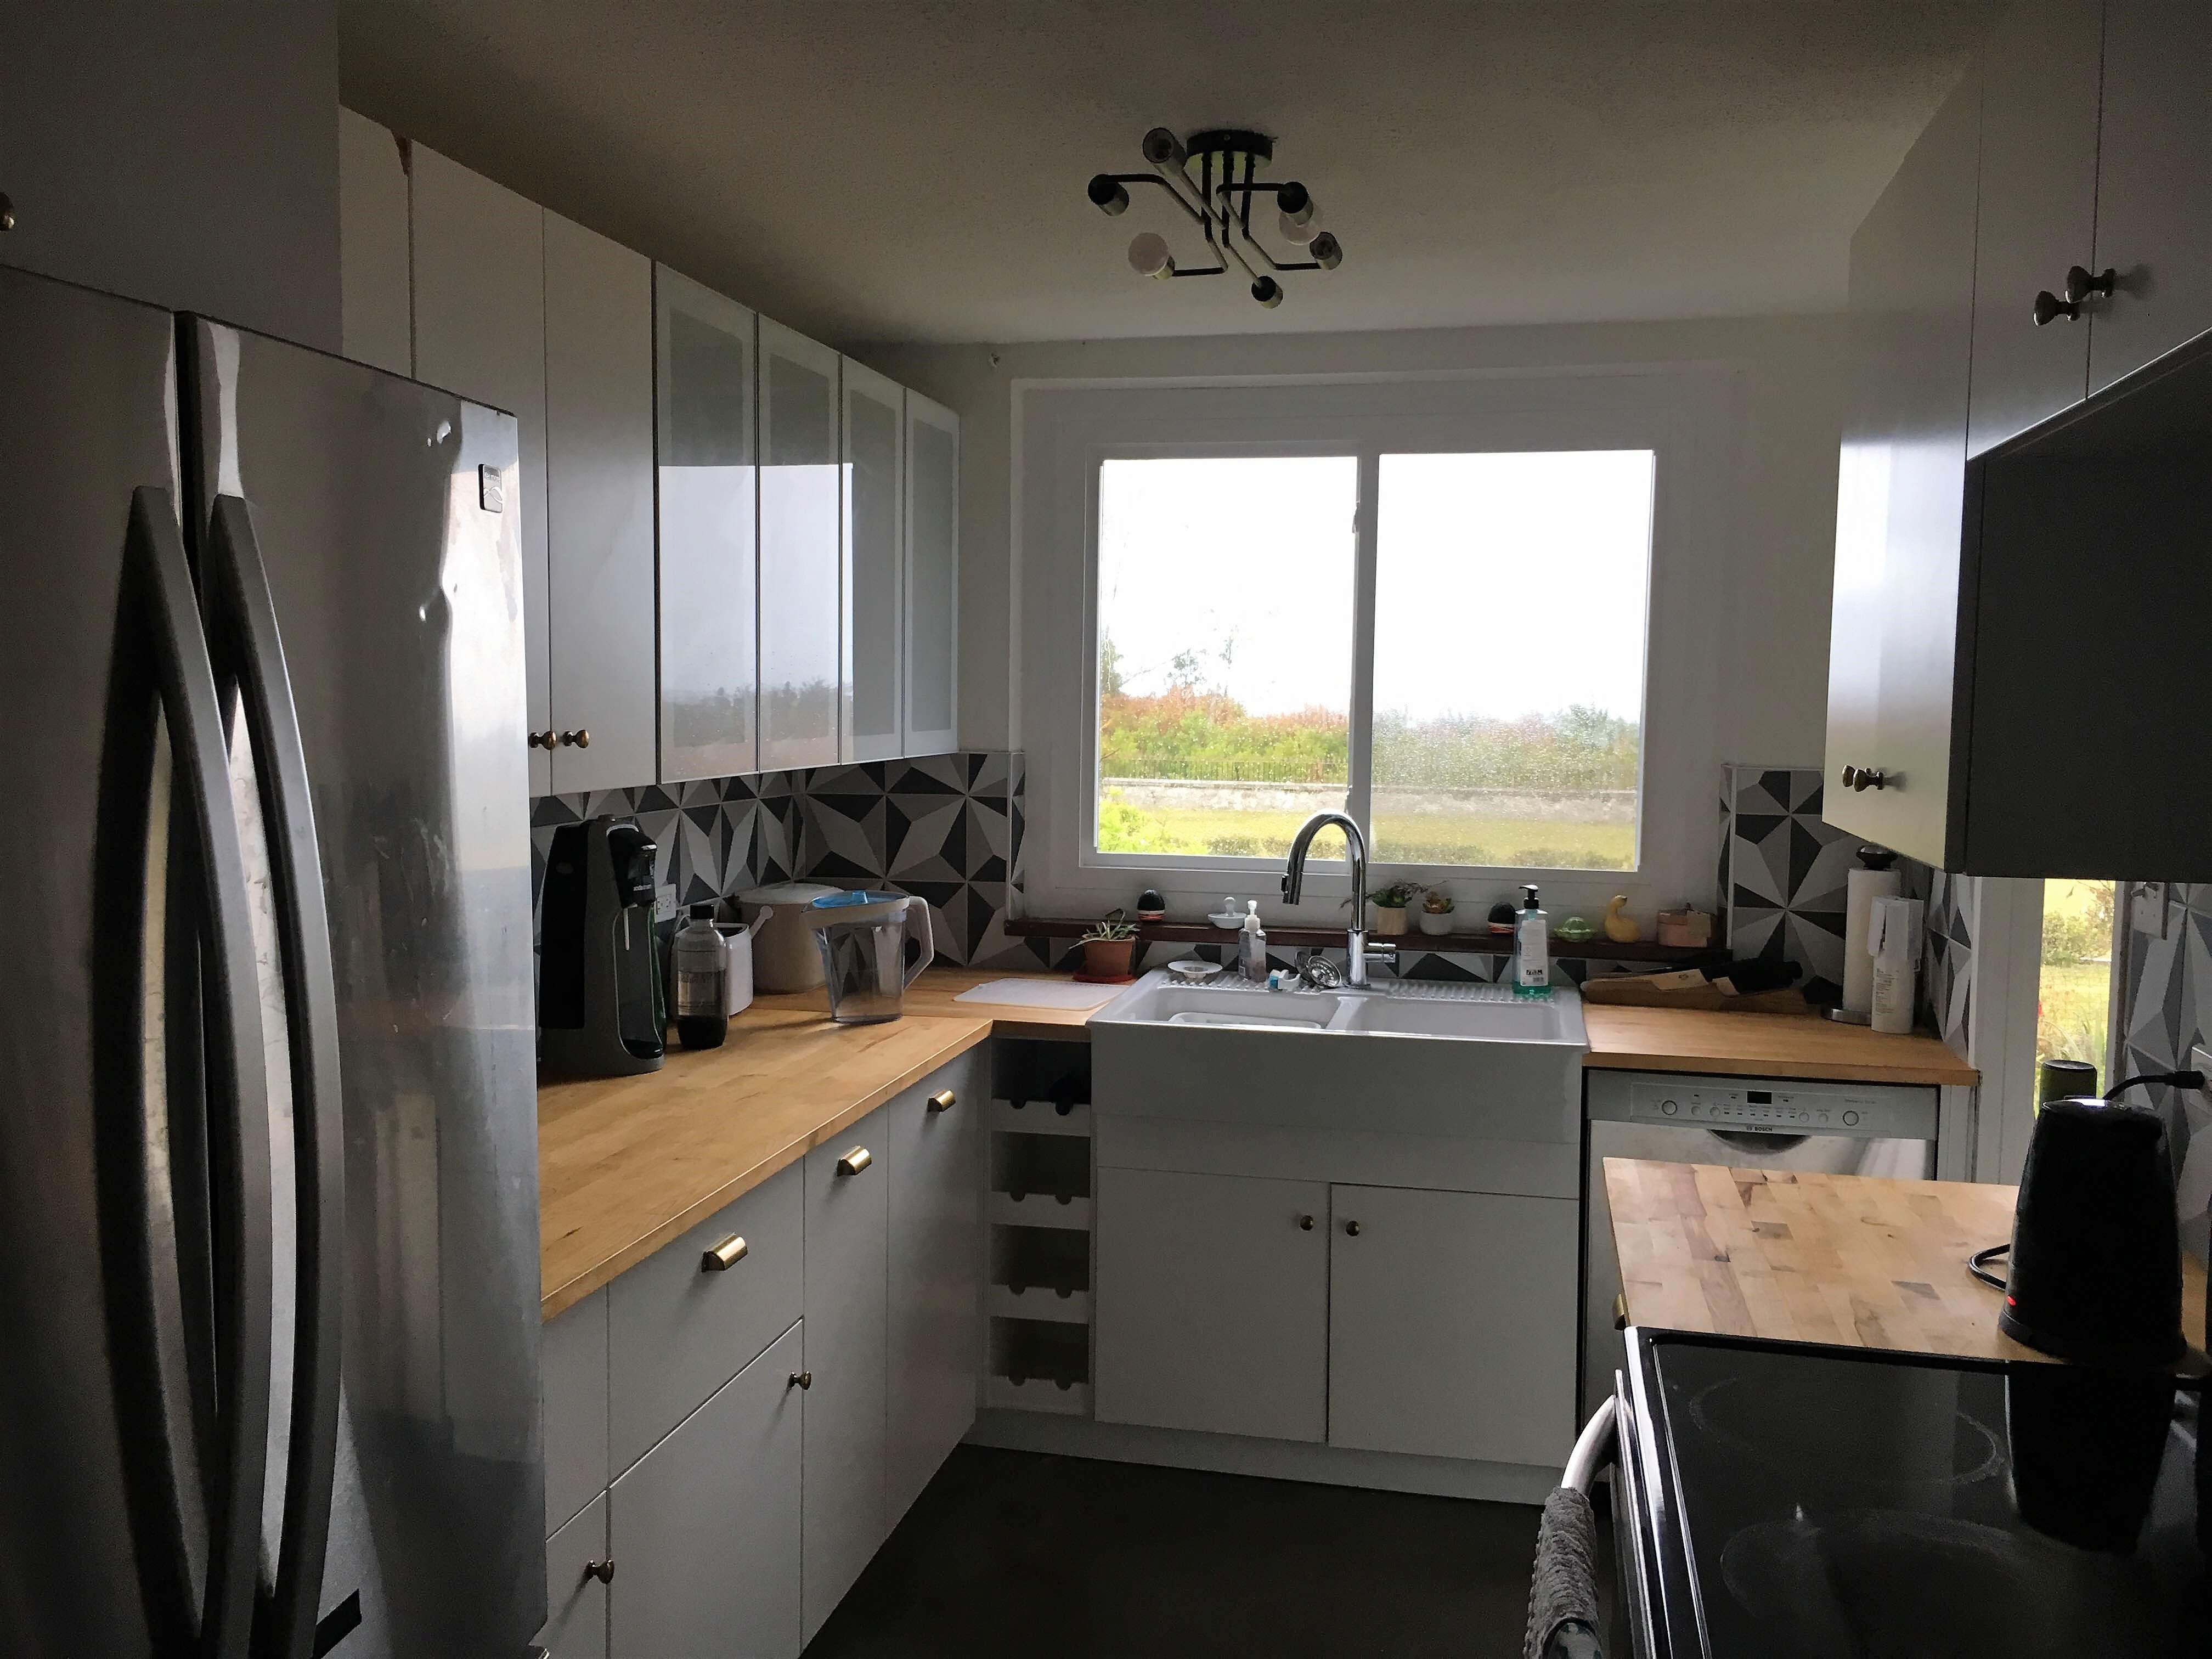 ikea kitchen in bermuda